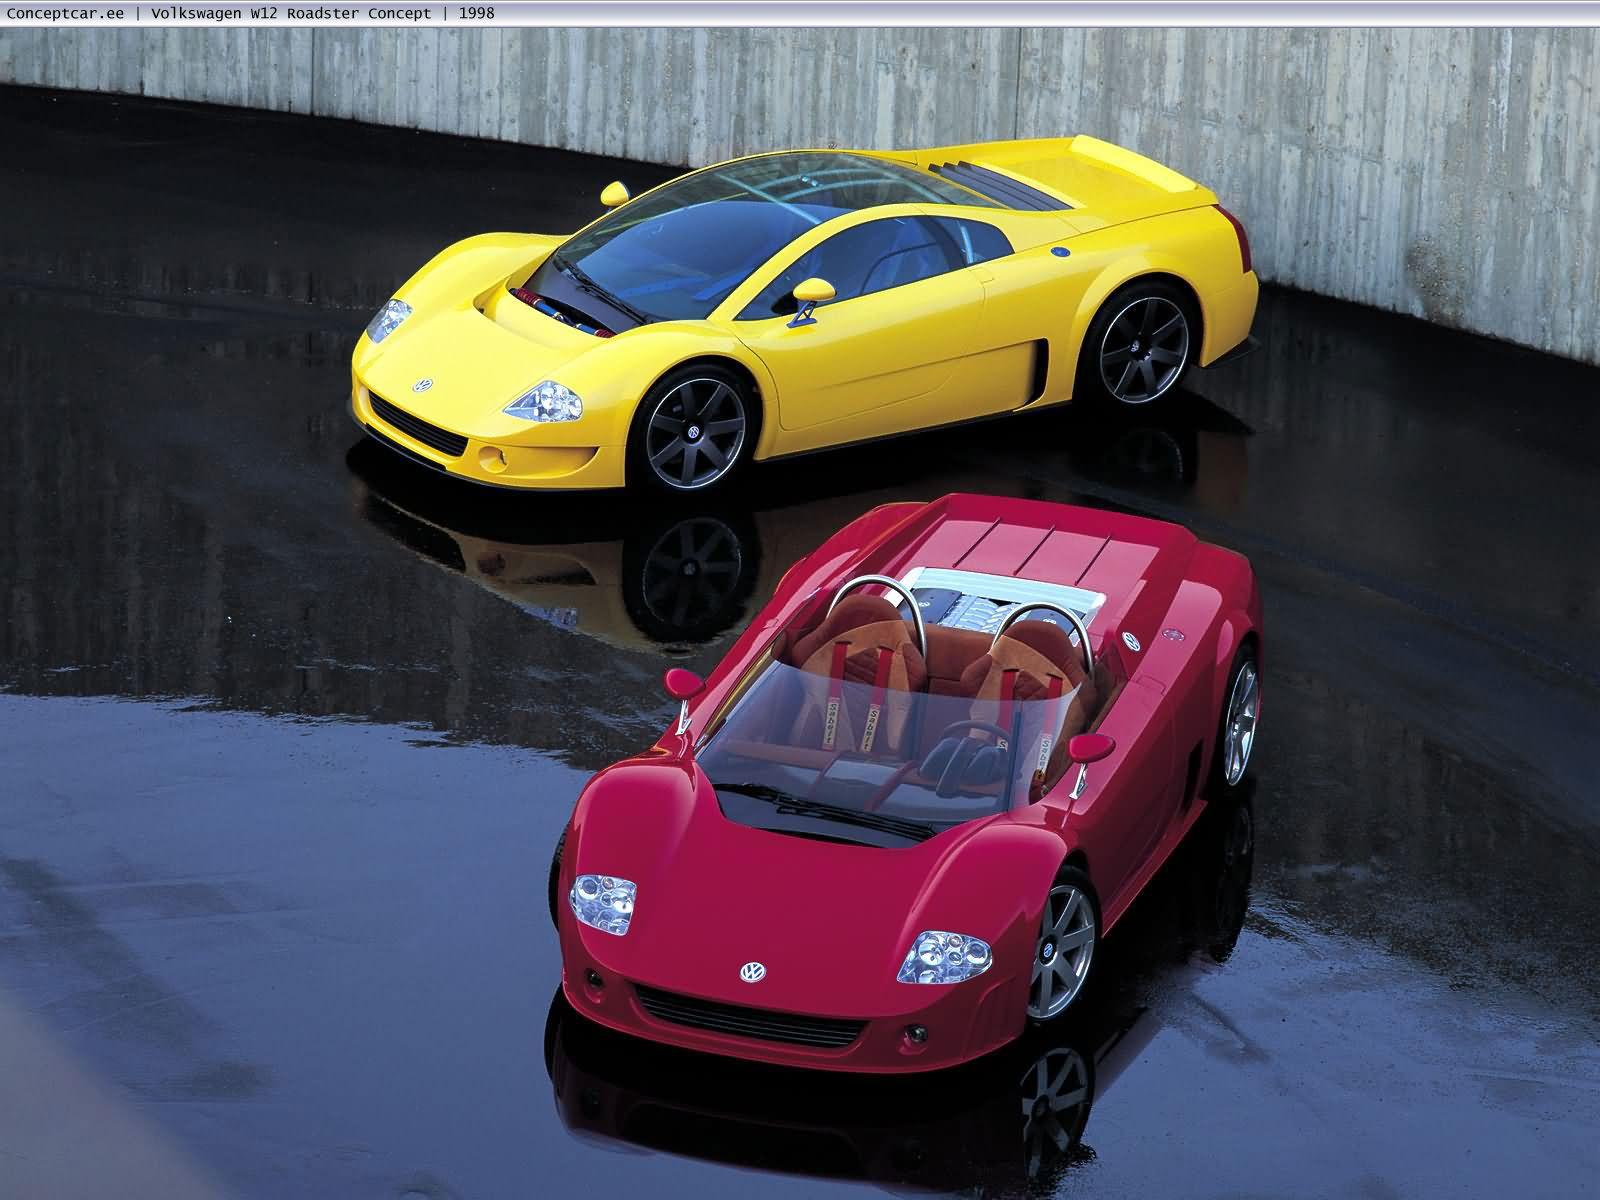 VW Roadster concept Toys for boys Pinterest